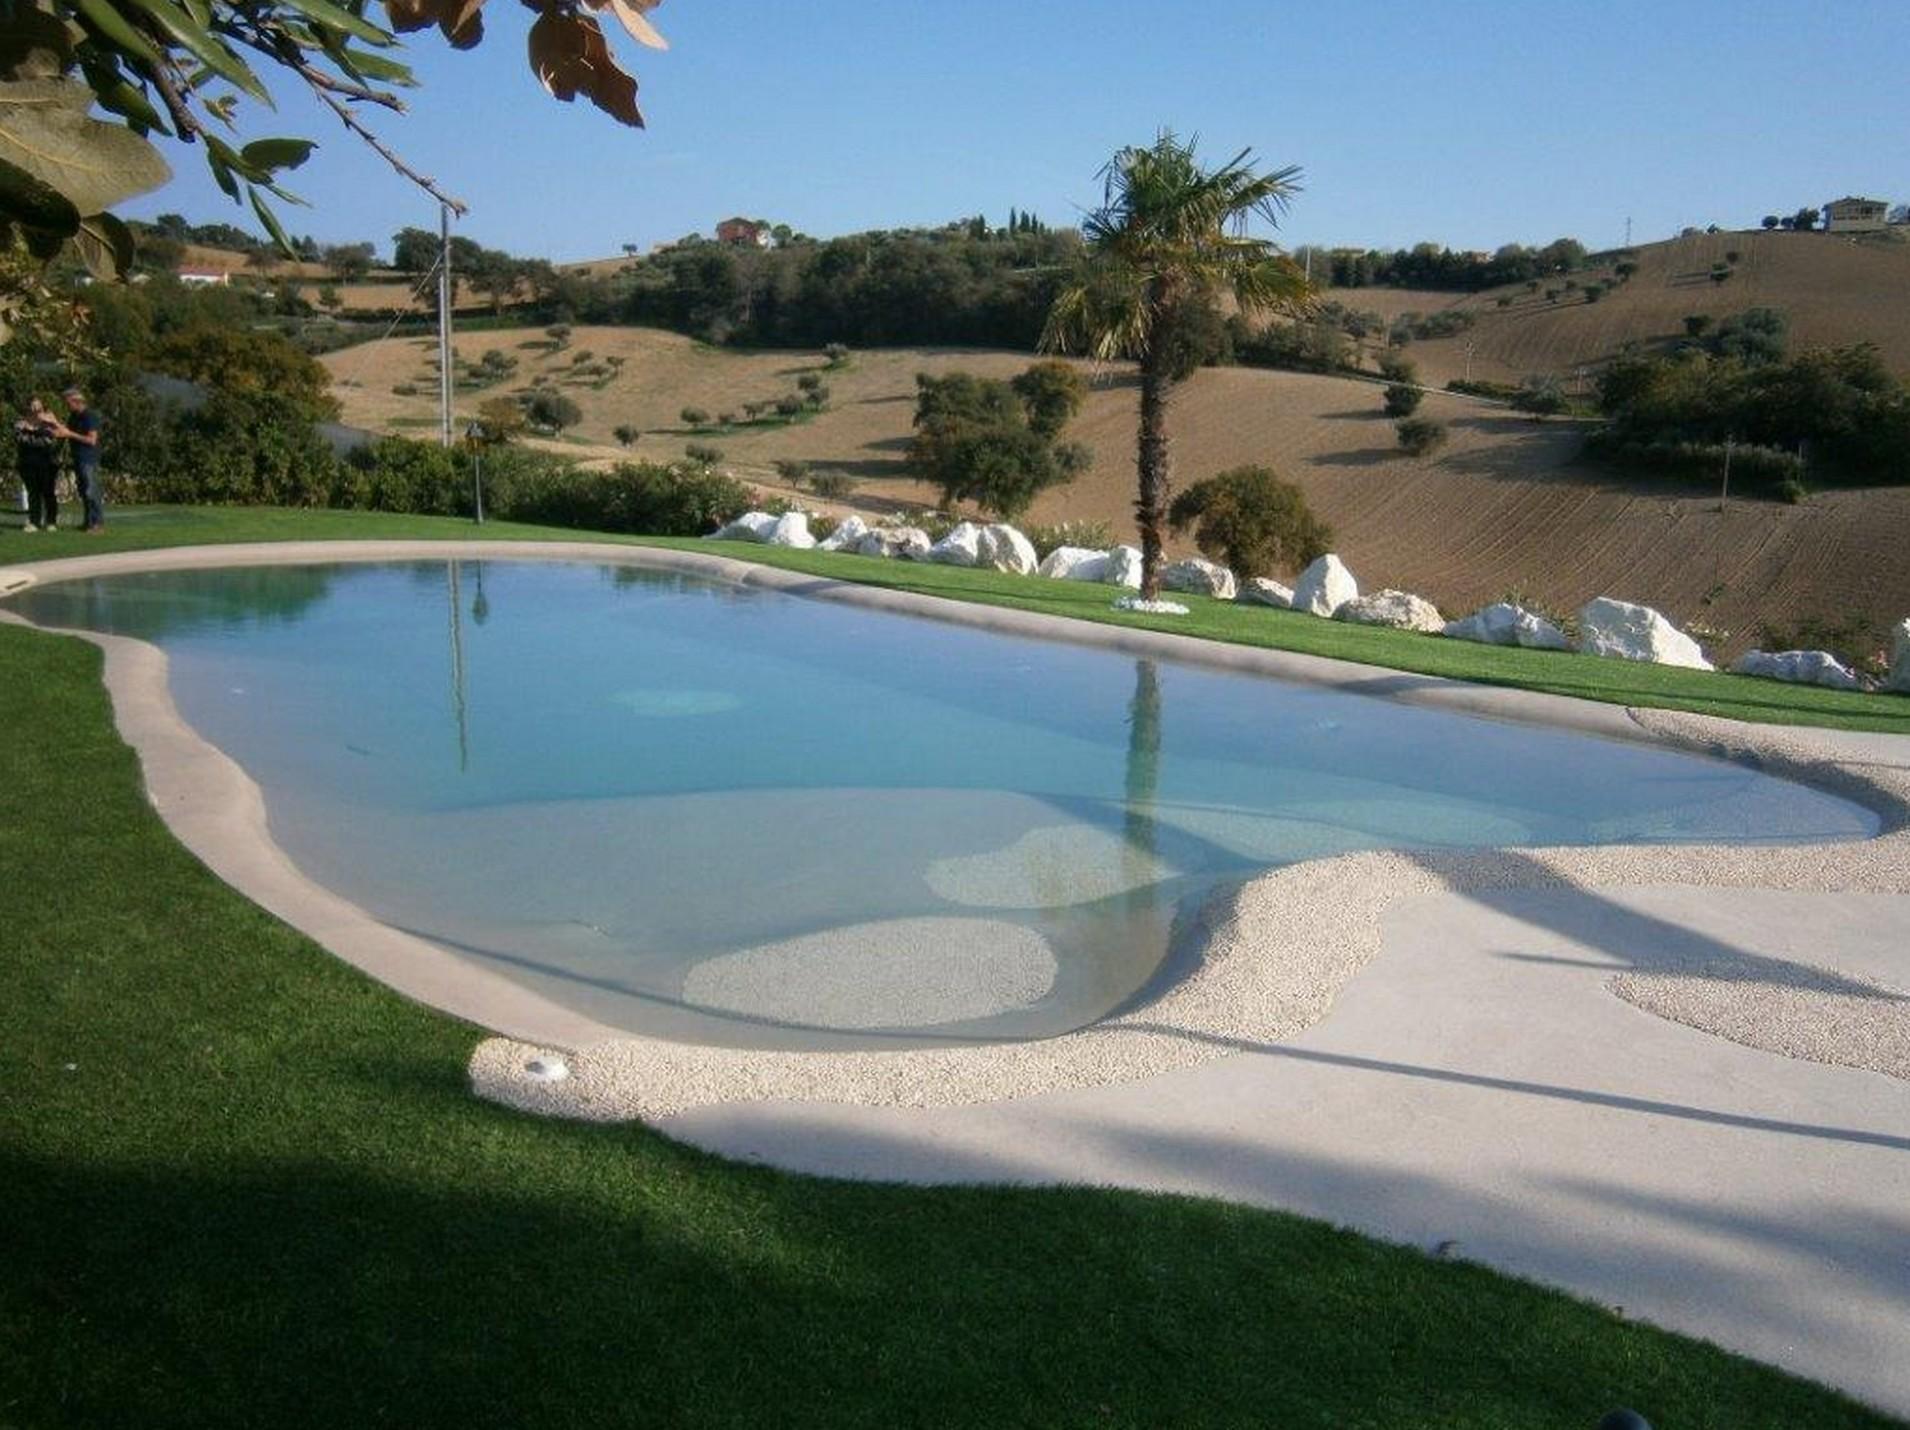 Biodesign piscinas naturales.